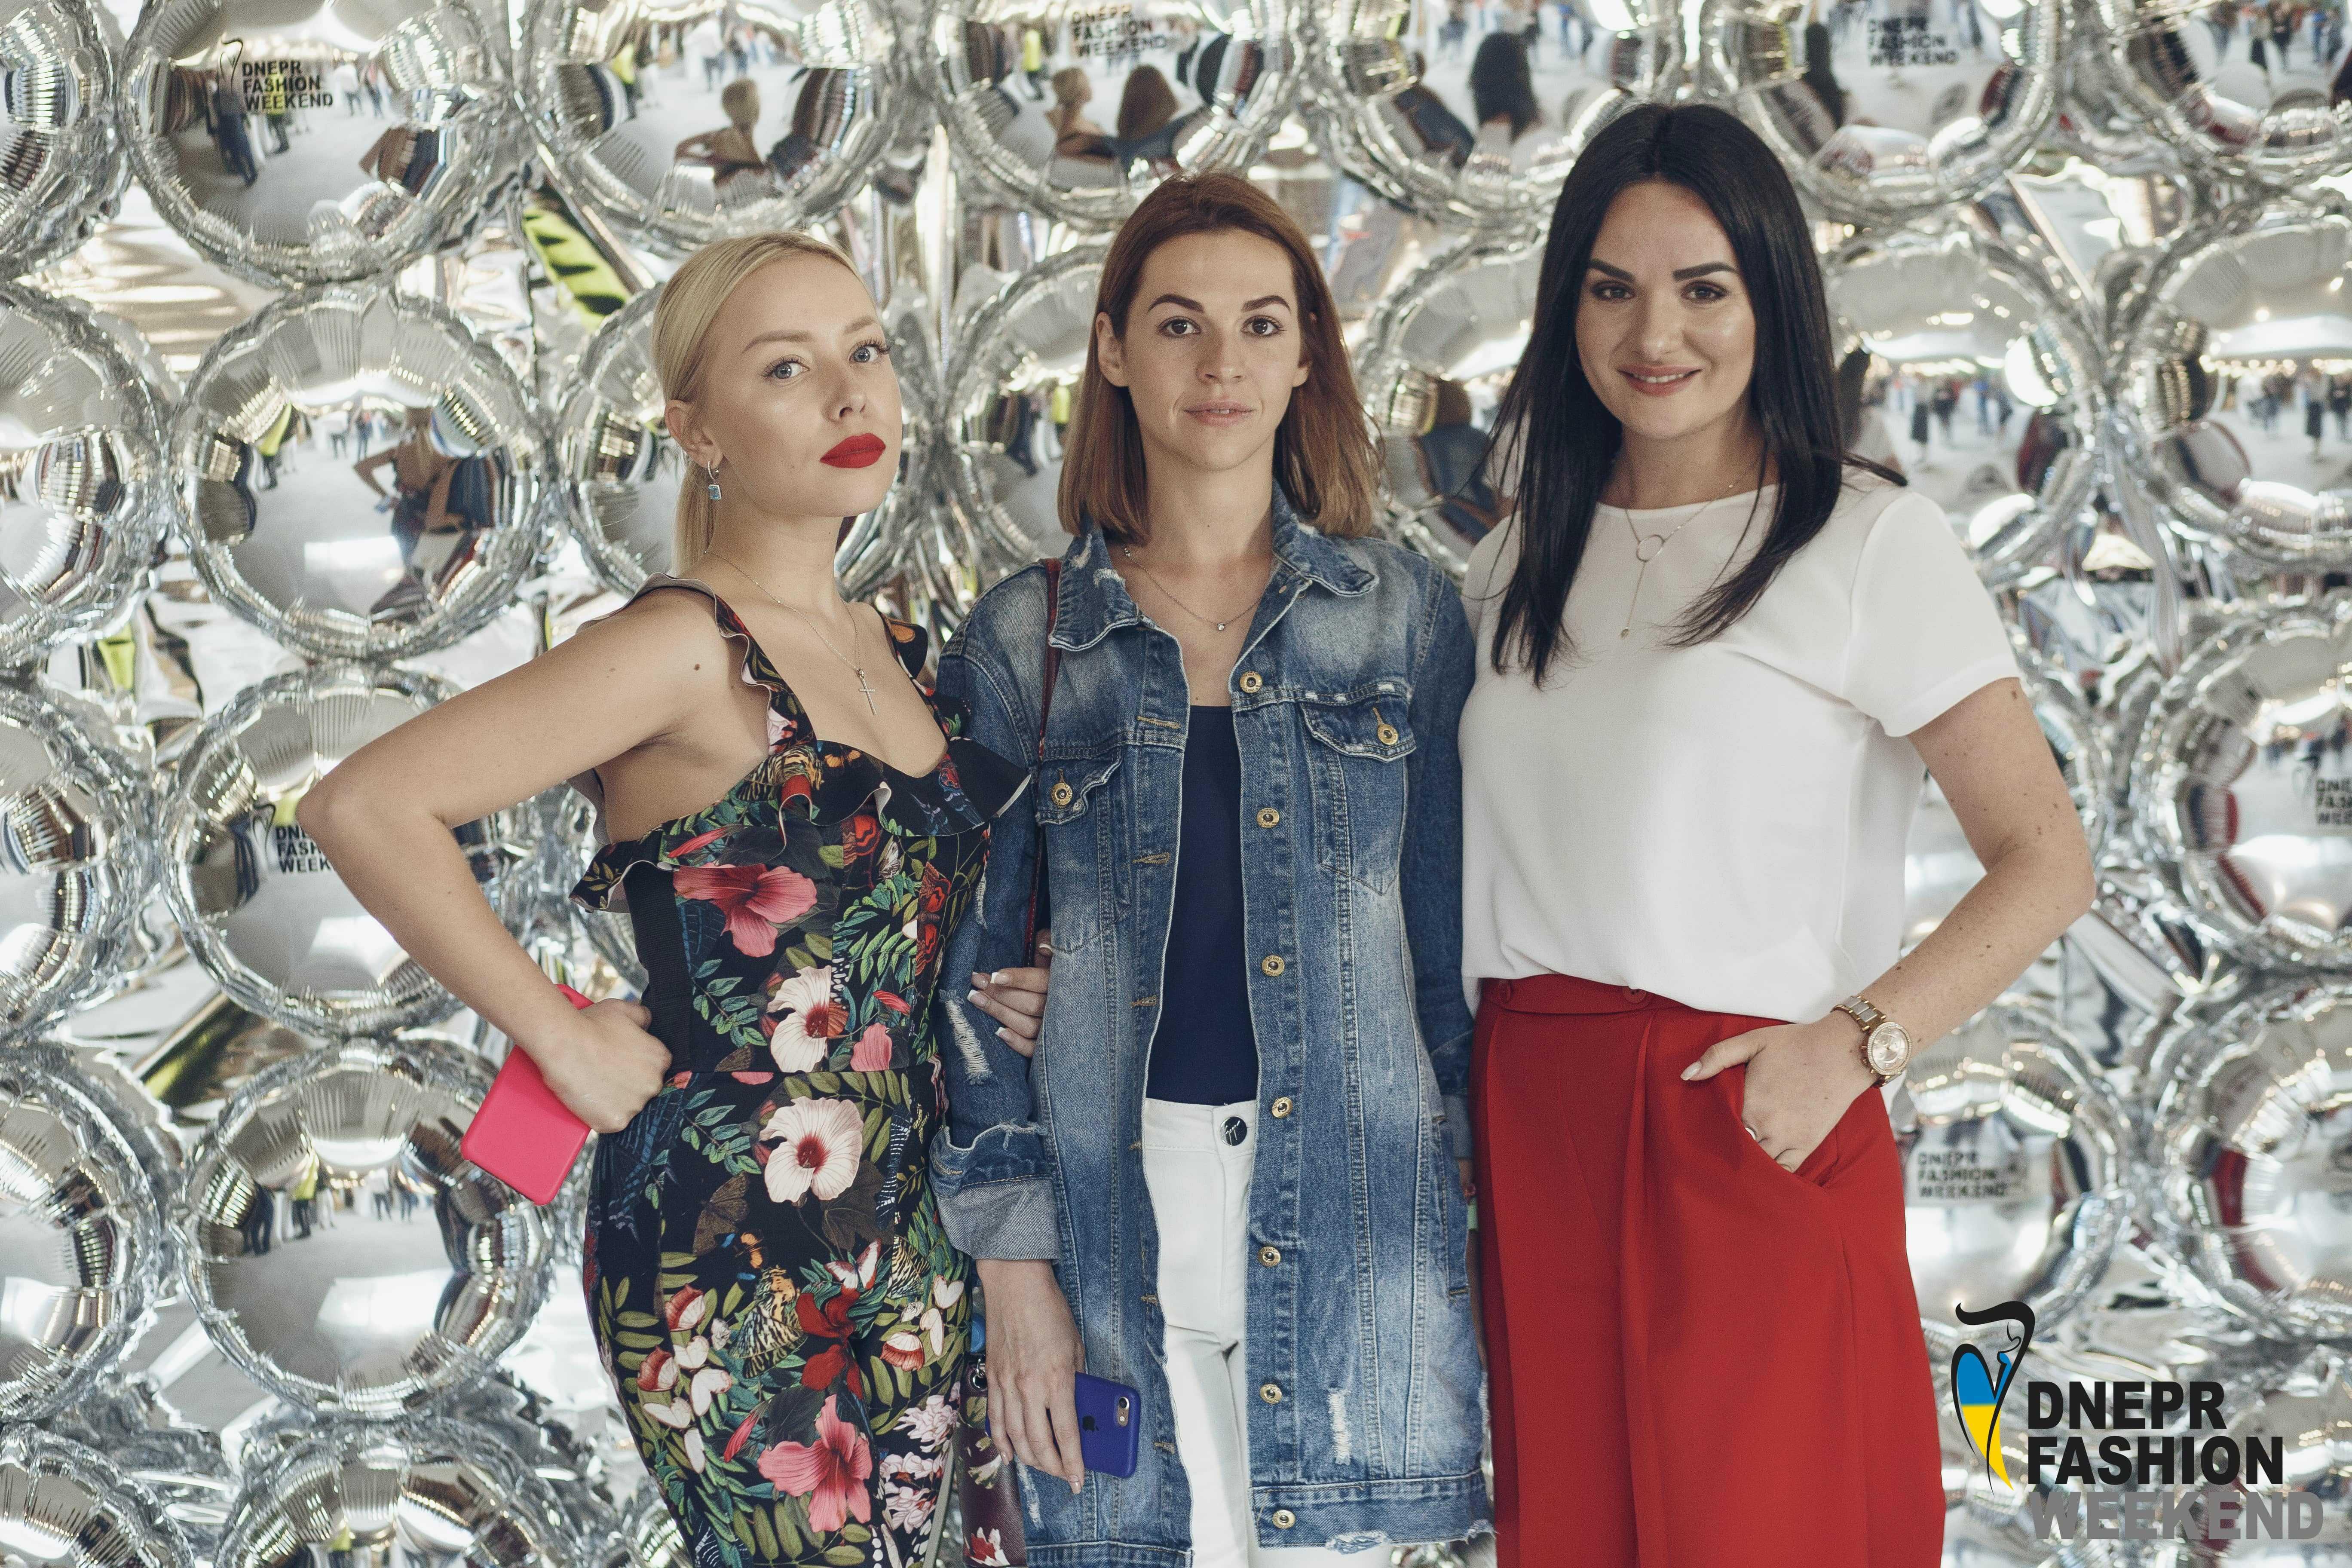 Хроники Dnepr Fashion Weekend как прошли три дня модного мероприятия 8